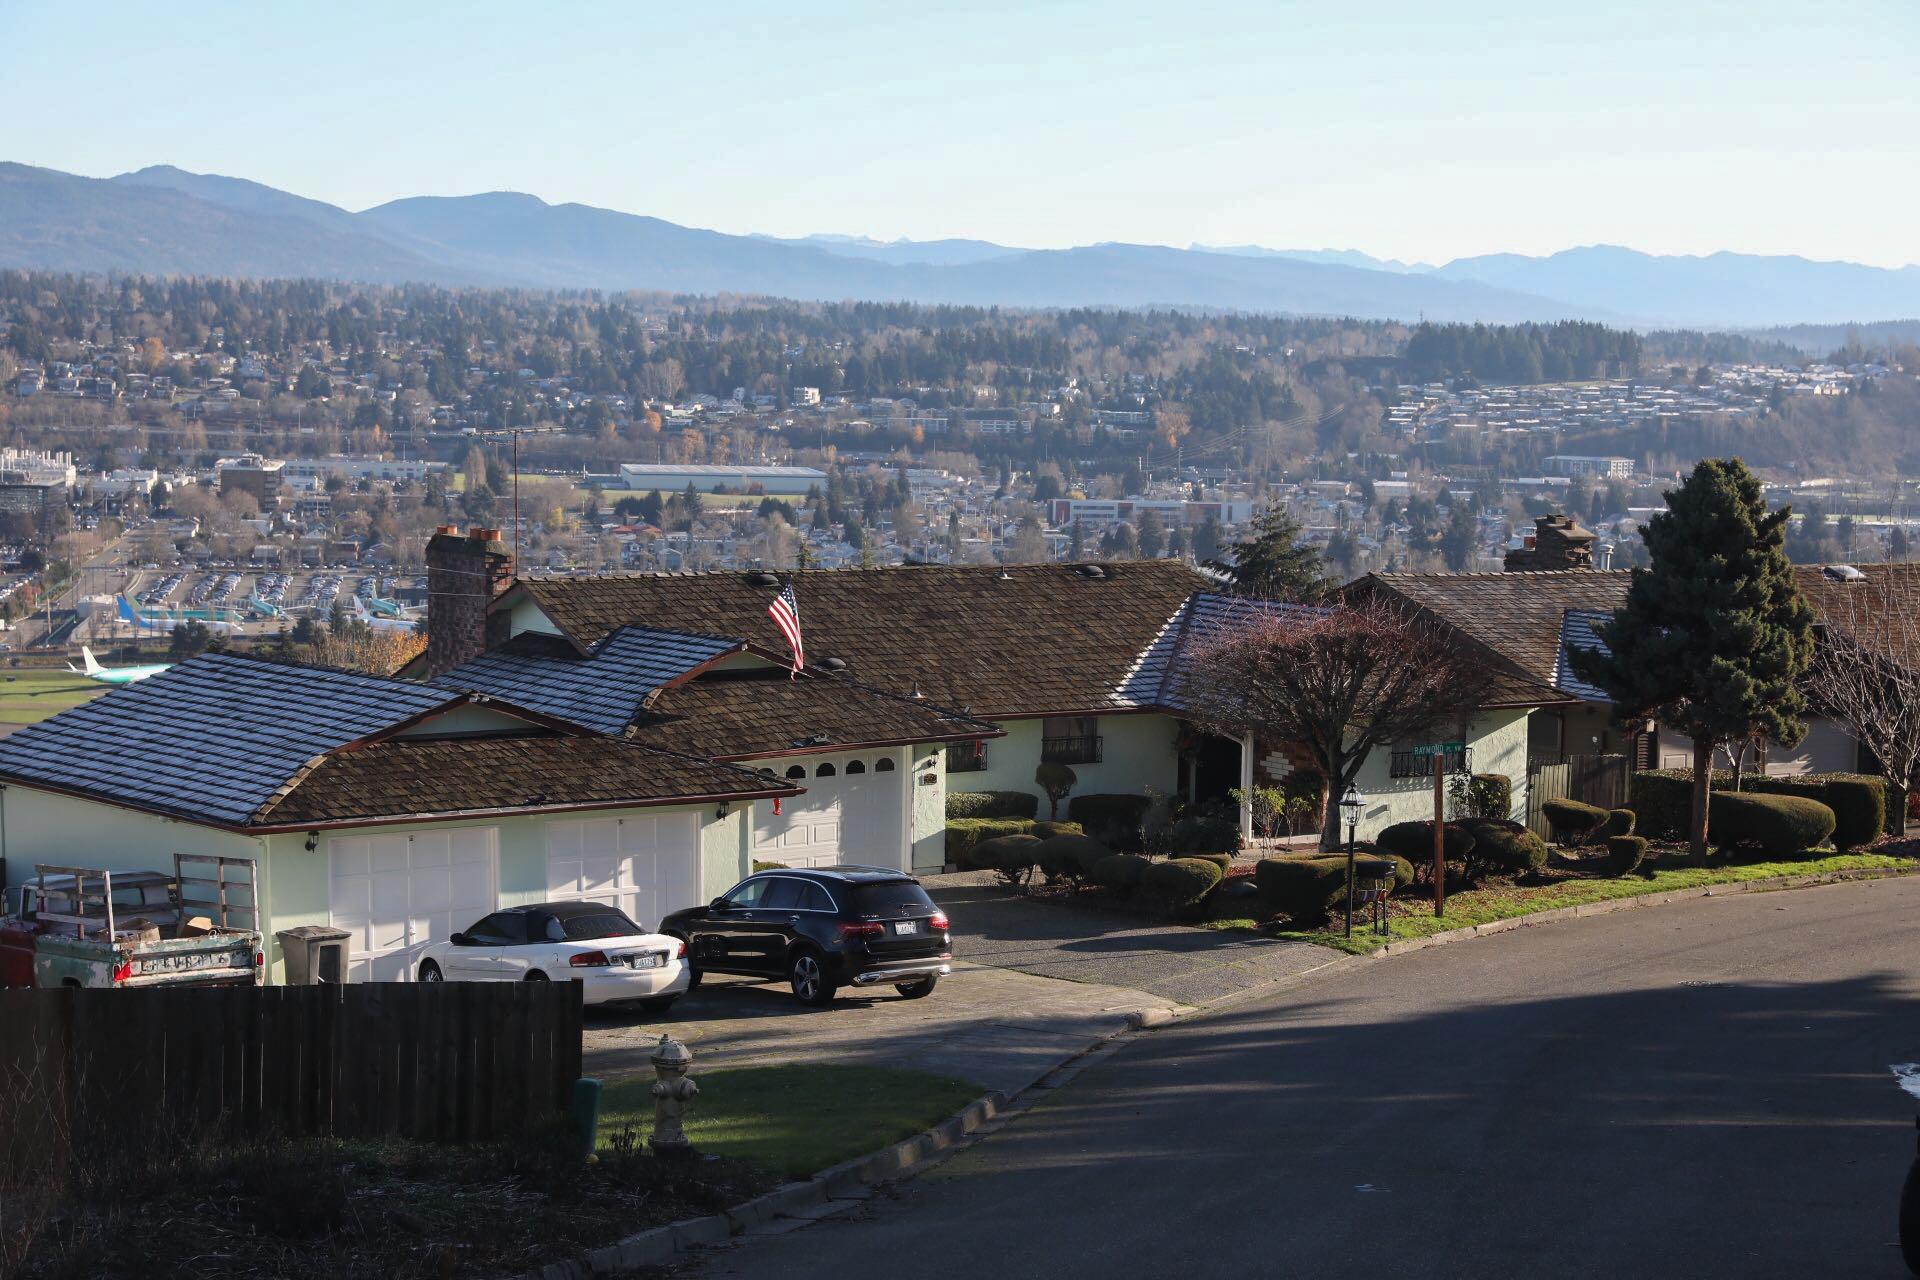 Facing High Housing Prices Renton Pushes Backyard Cottages Crosscut